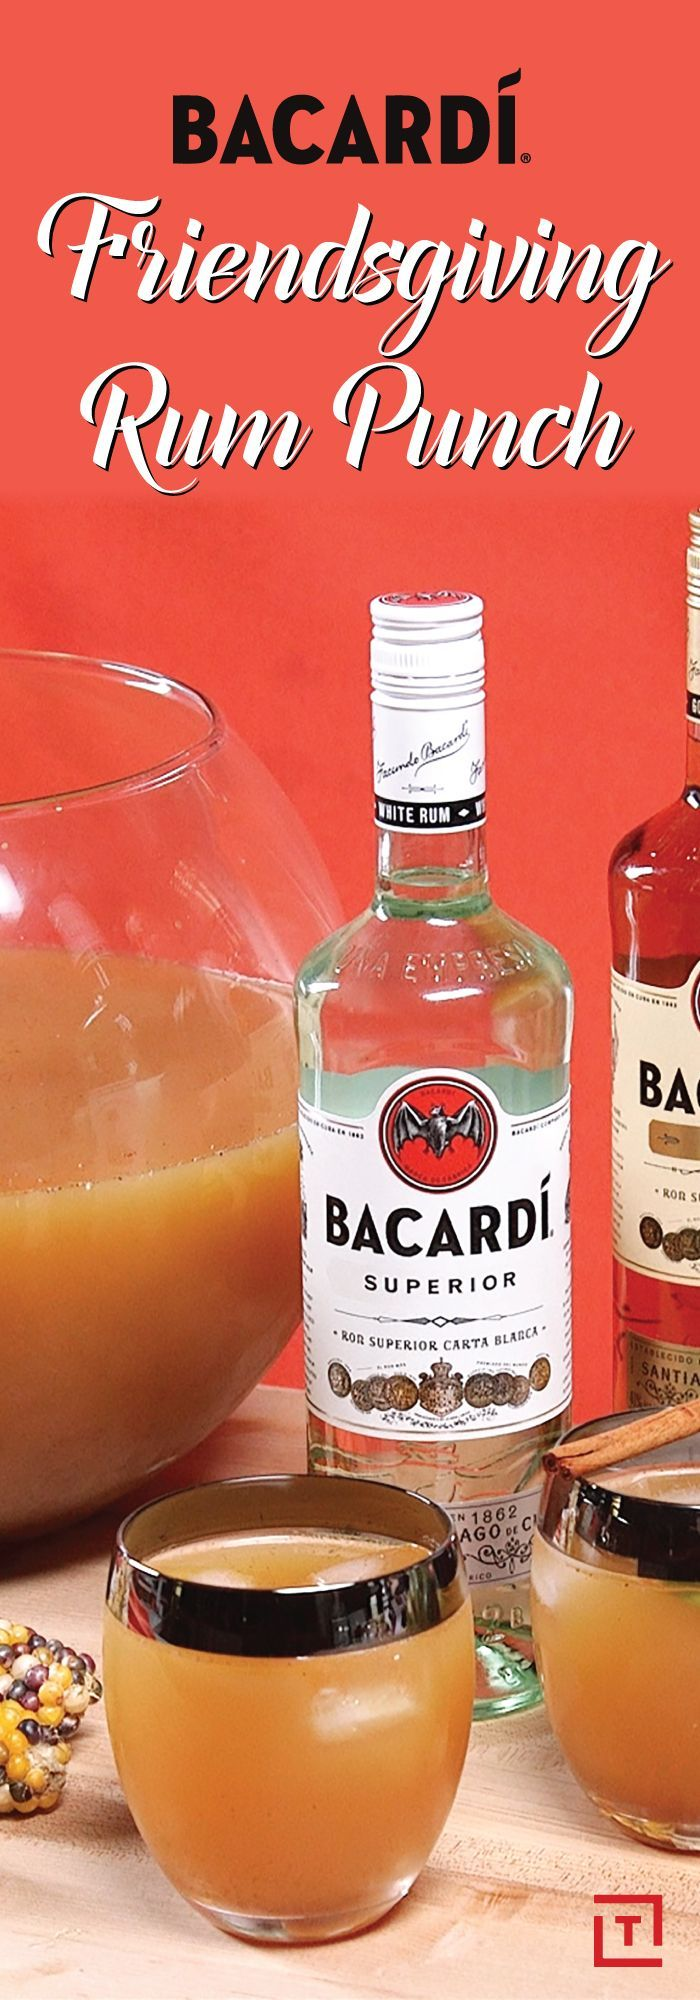 Bacardi Friendsgiving Rum Punch Christmas Drinks Recipes Rum Punch Thanksgiving Drinks